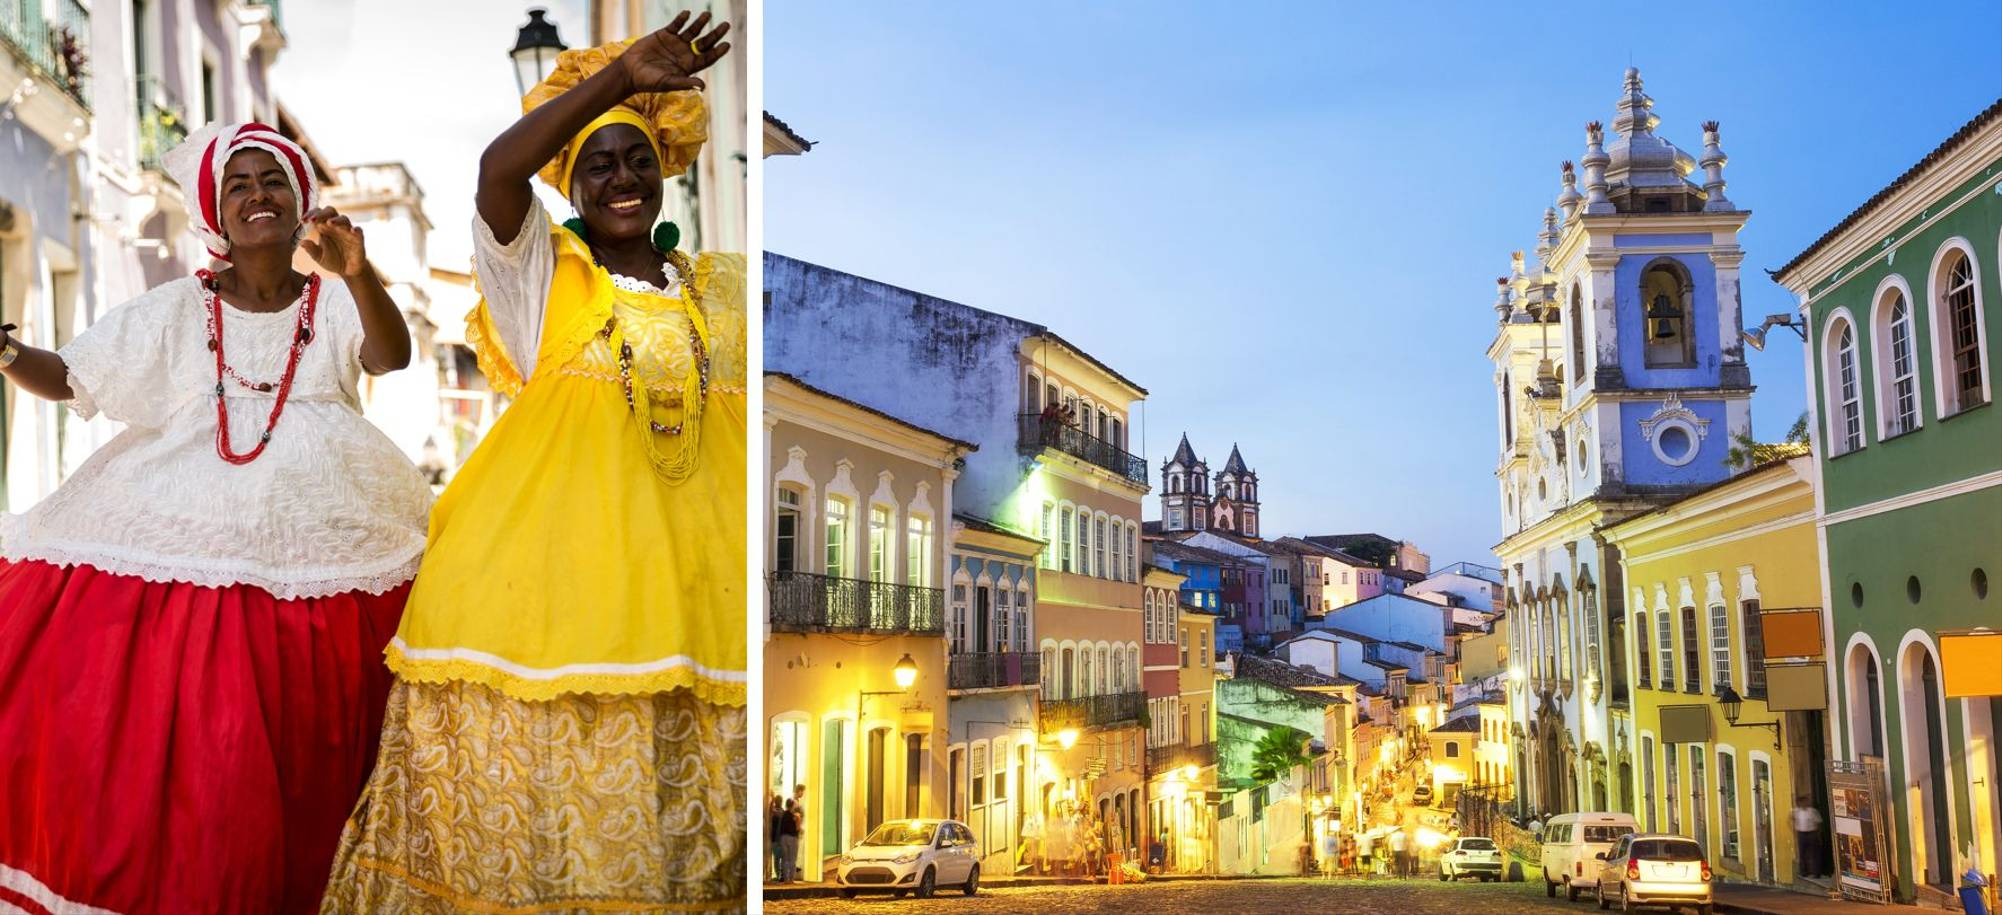 17 Day - Salvador Bahia, Brazil - Itinerary Desktop.jpg